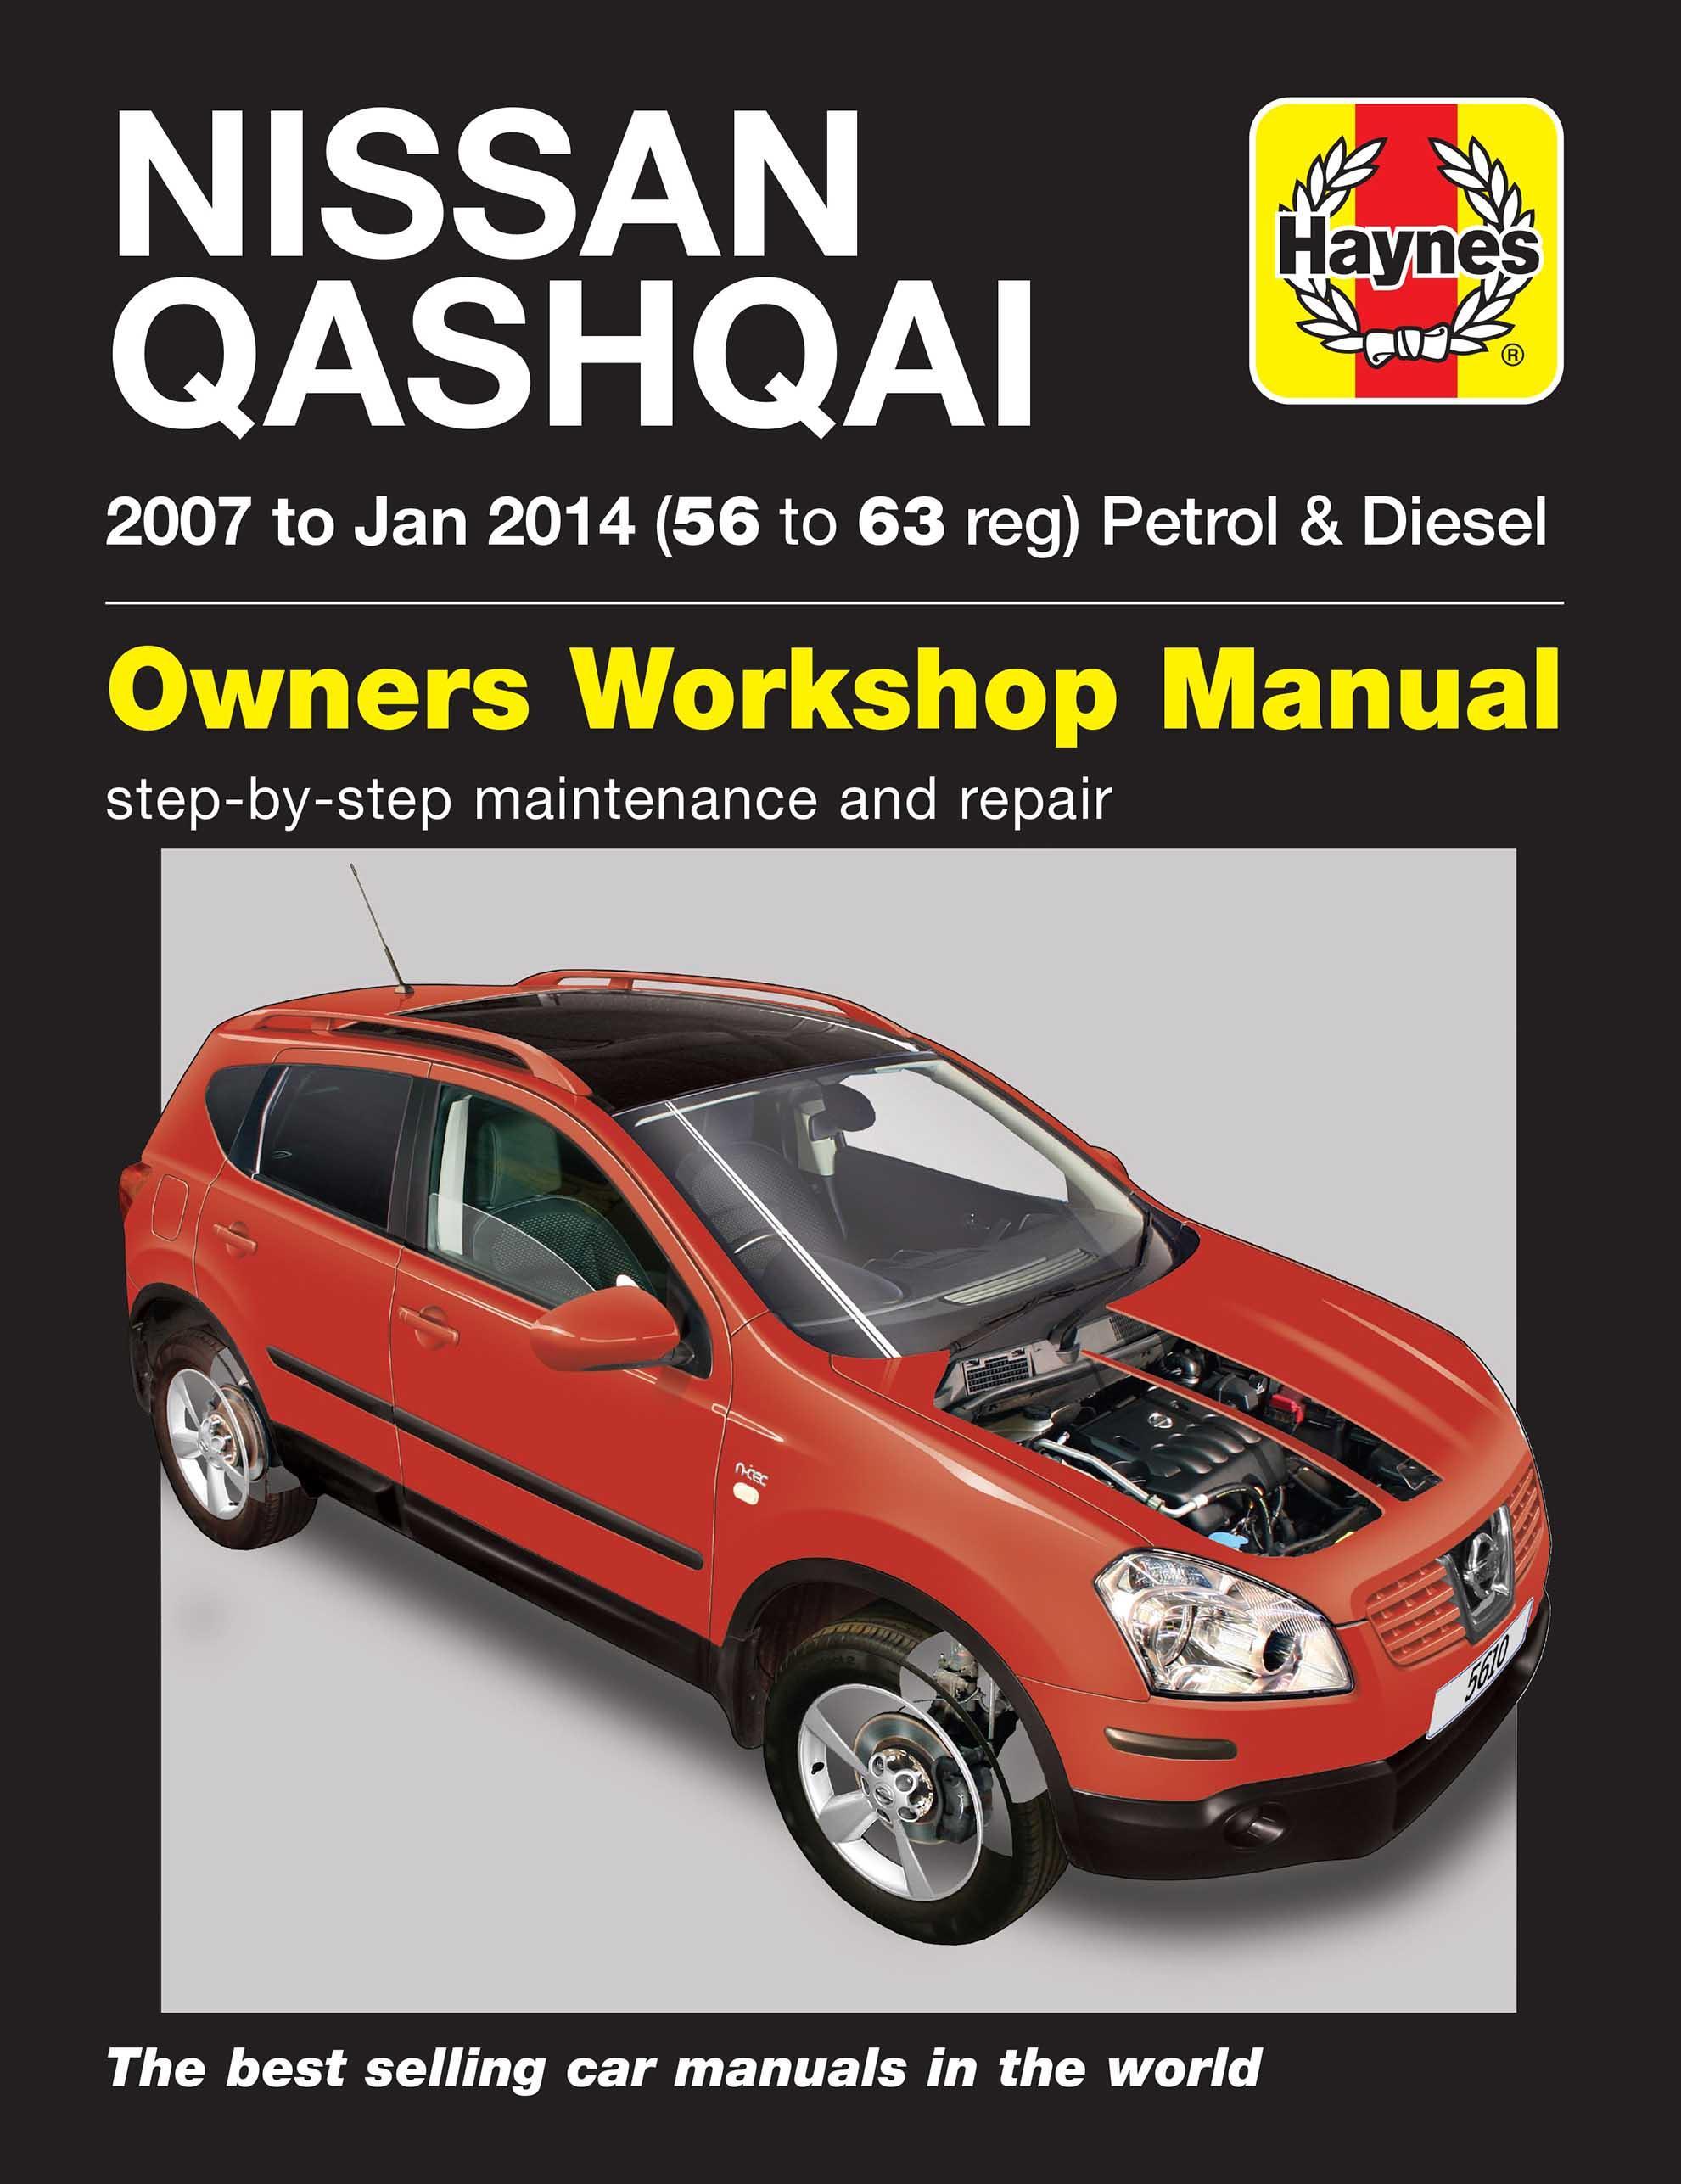 haynes nissan qashqai petrol dies rh halfords com Manuals Nissan Originaservice Nissan Factory Service Manual